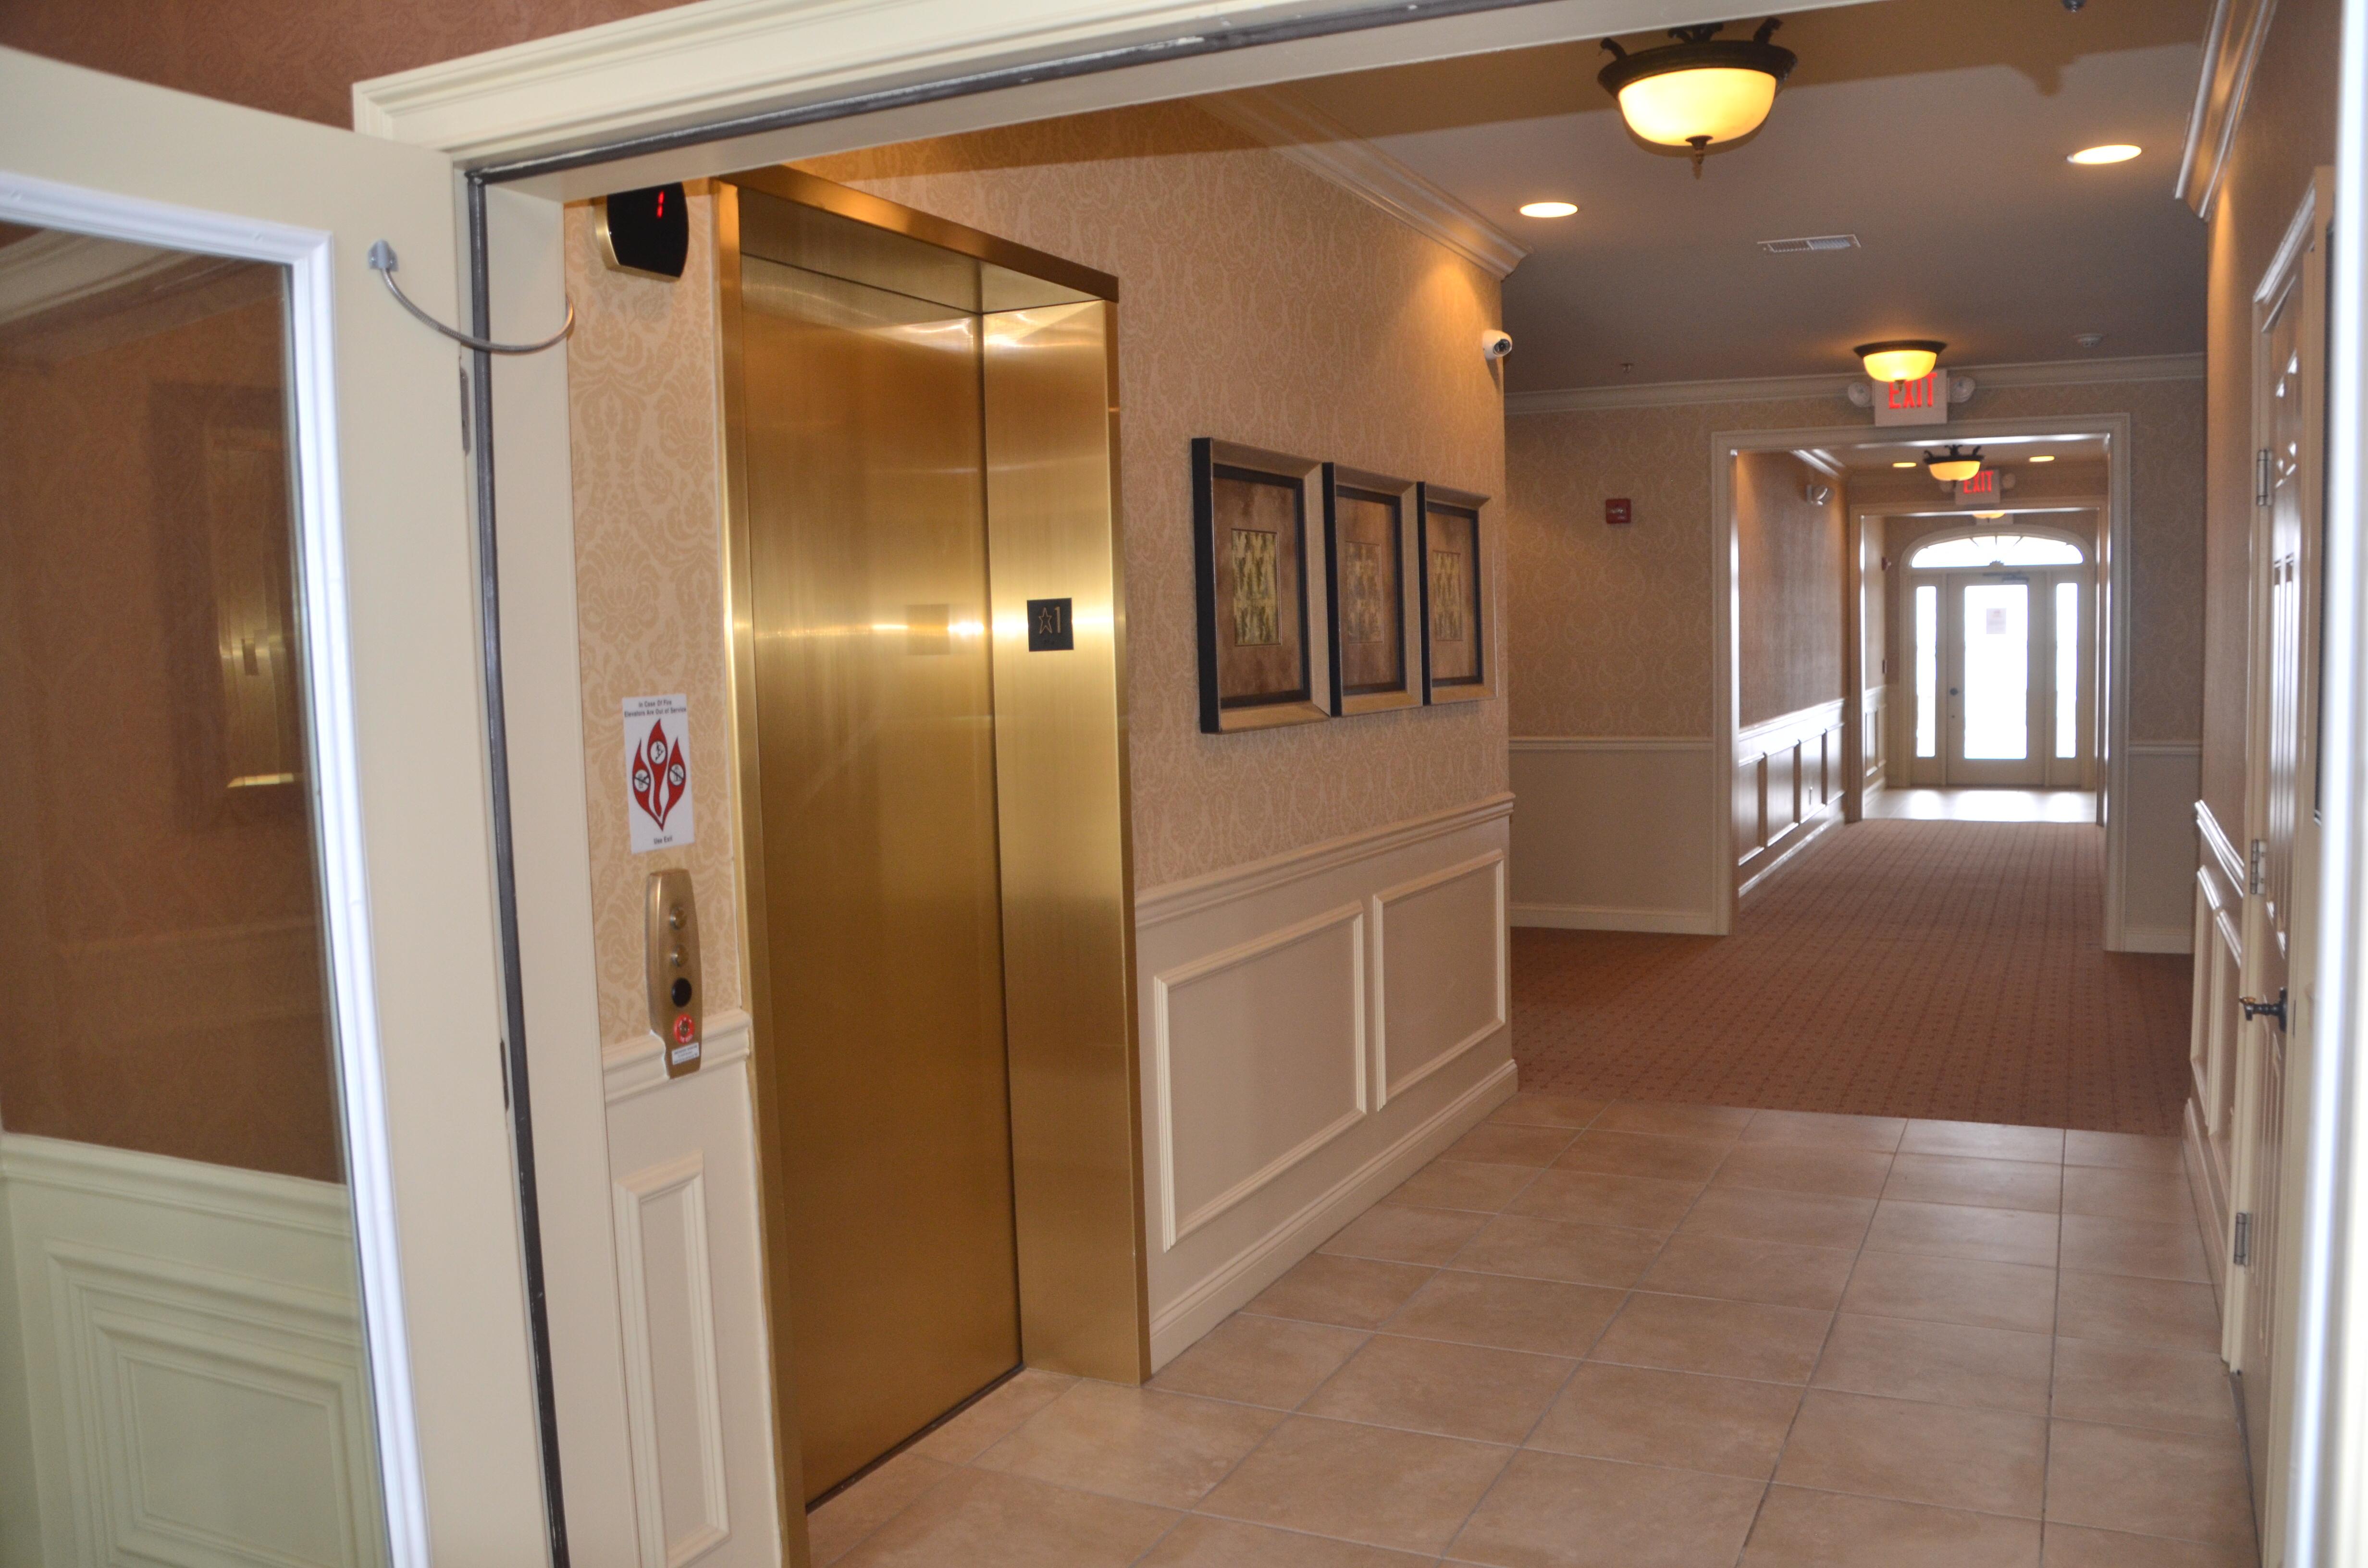 Lobby & Hallways